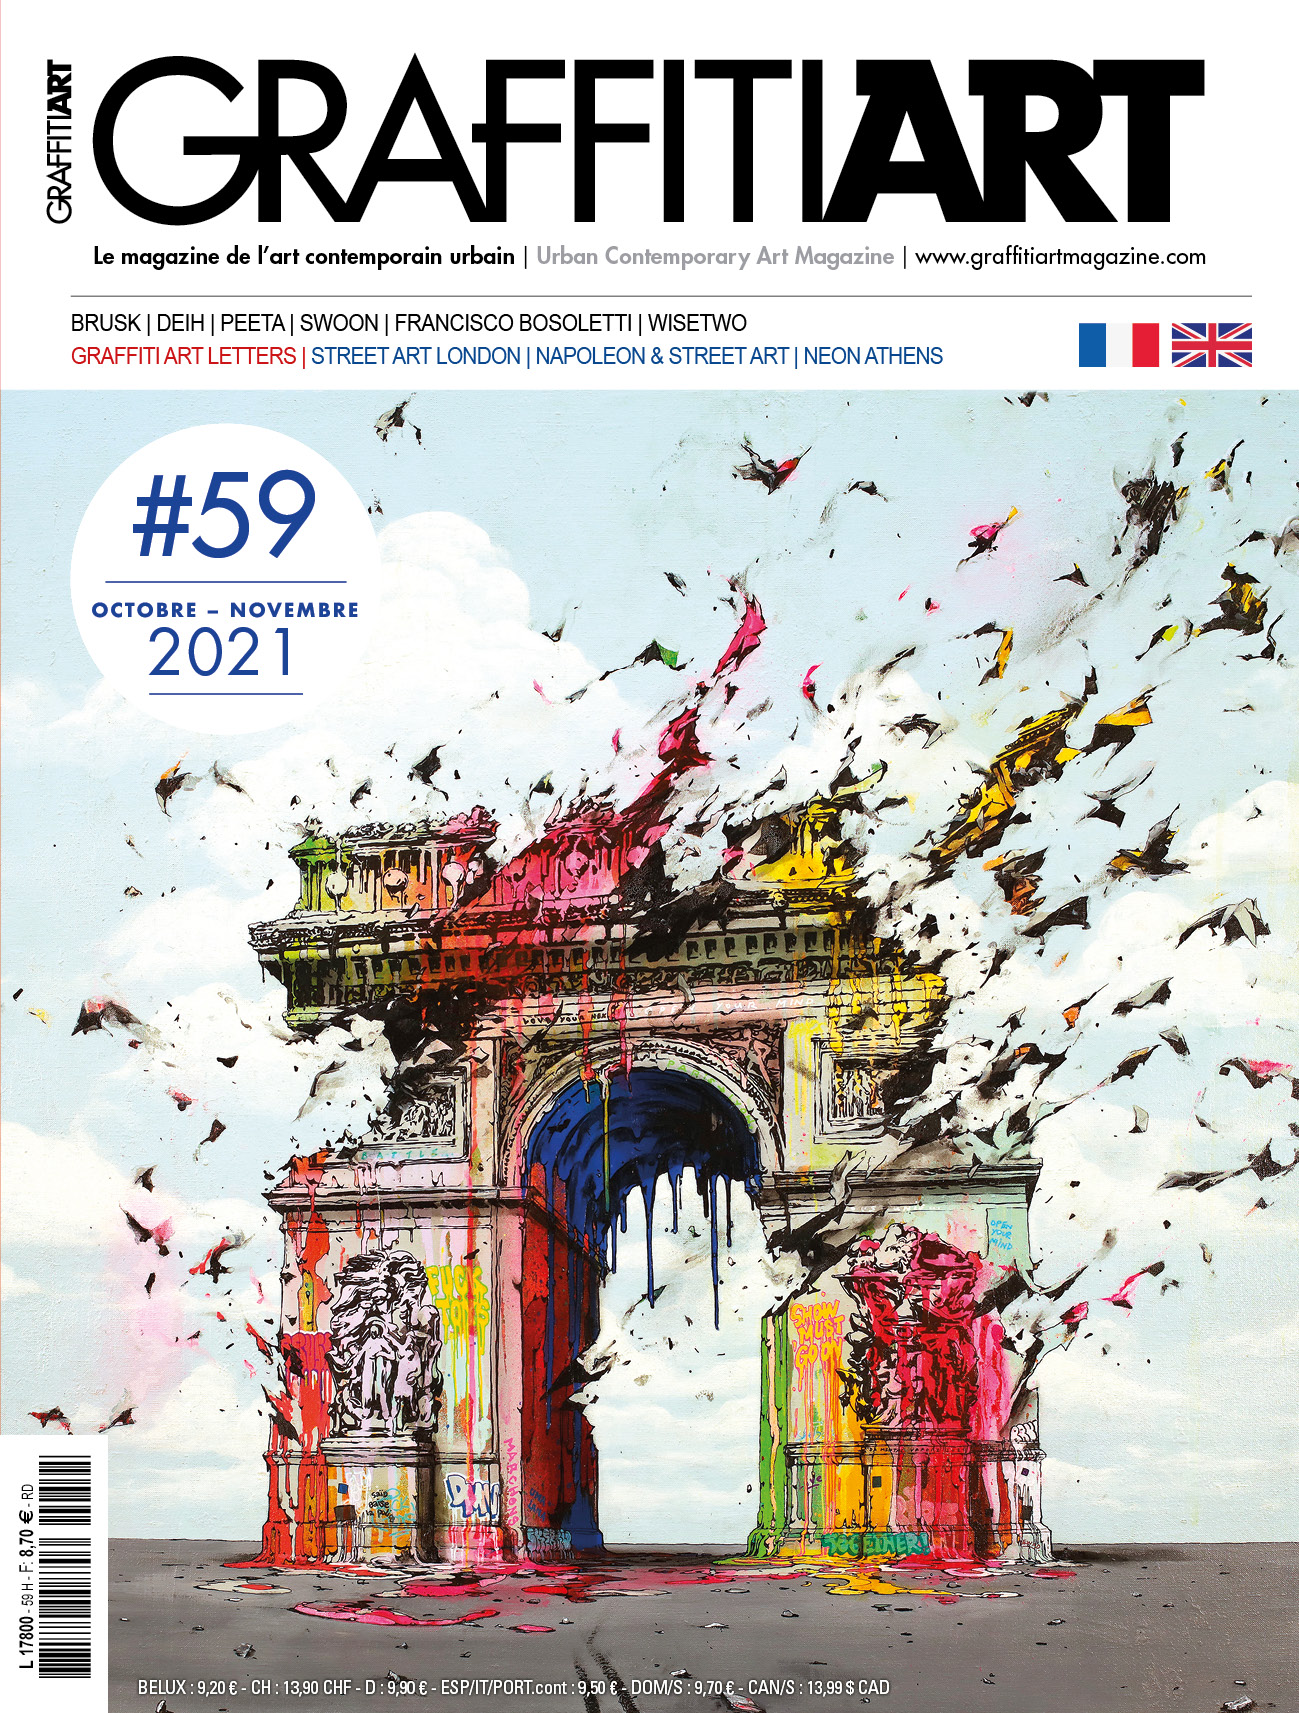 GraffitiART 58 - Cover